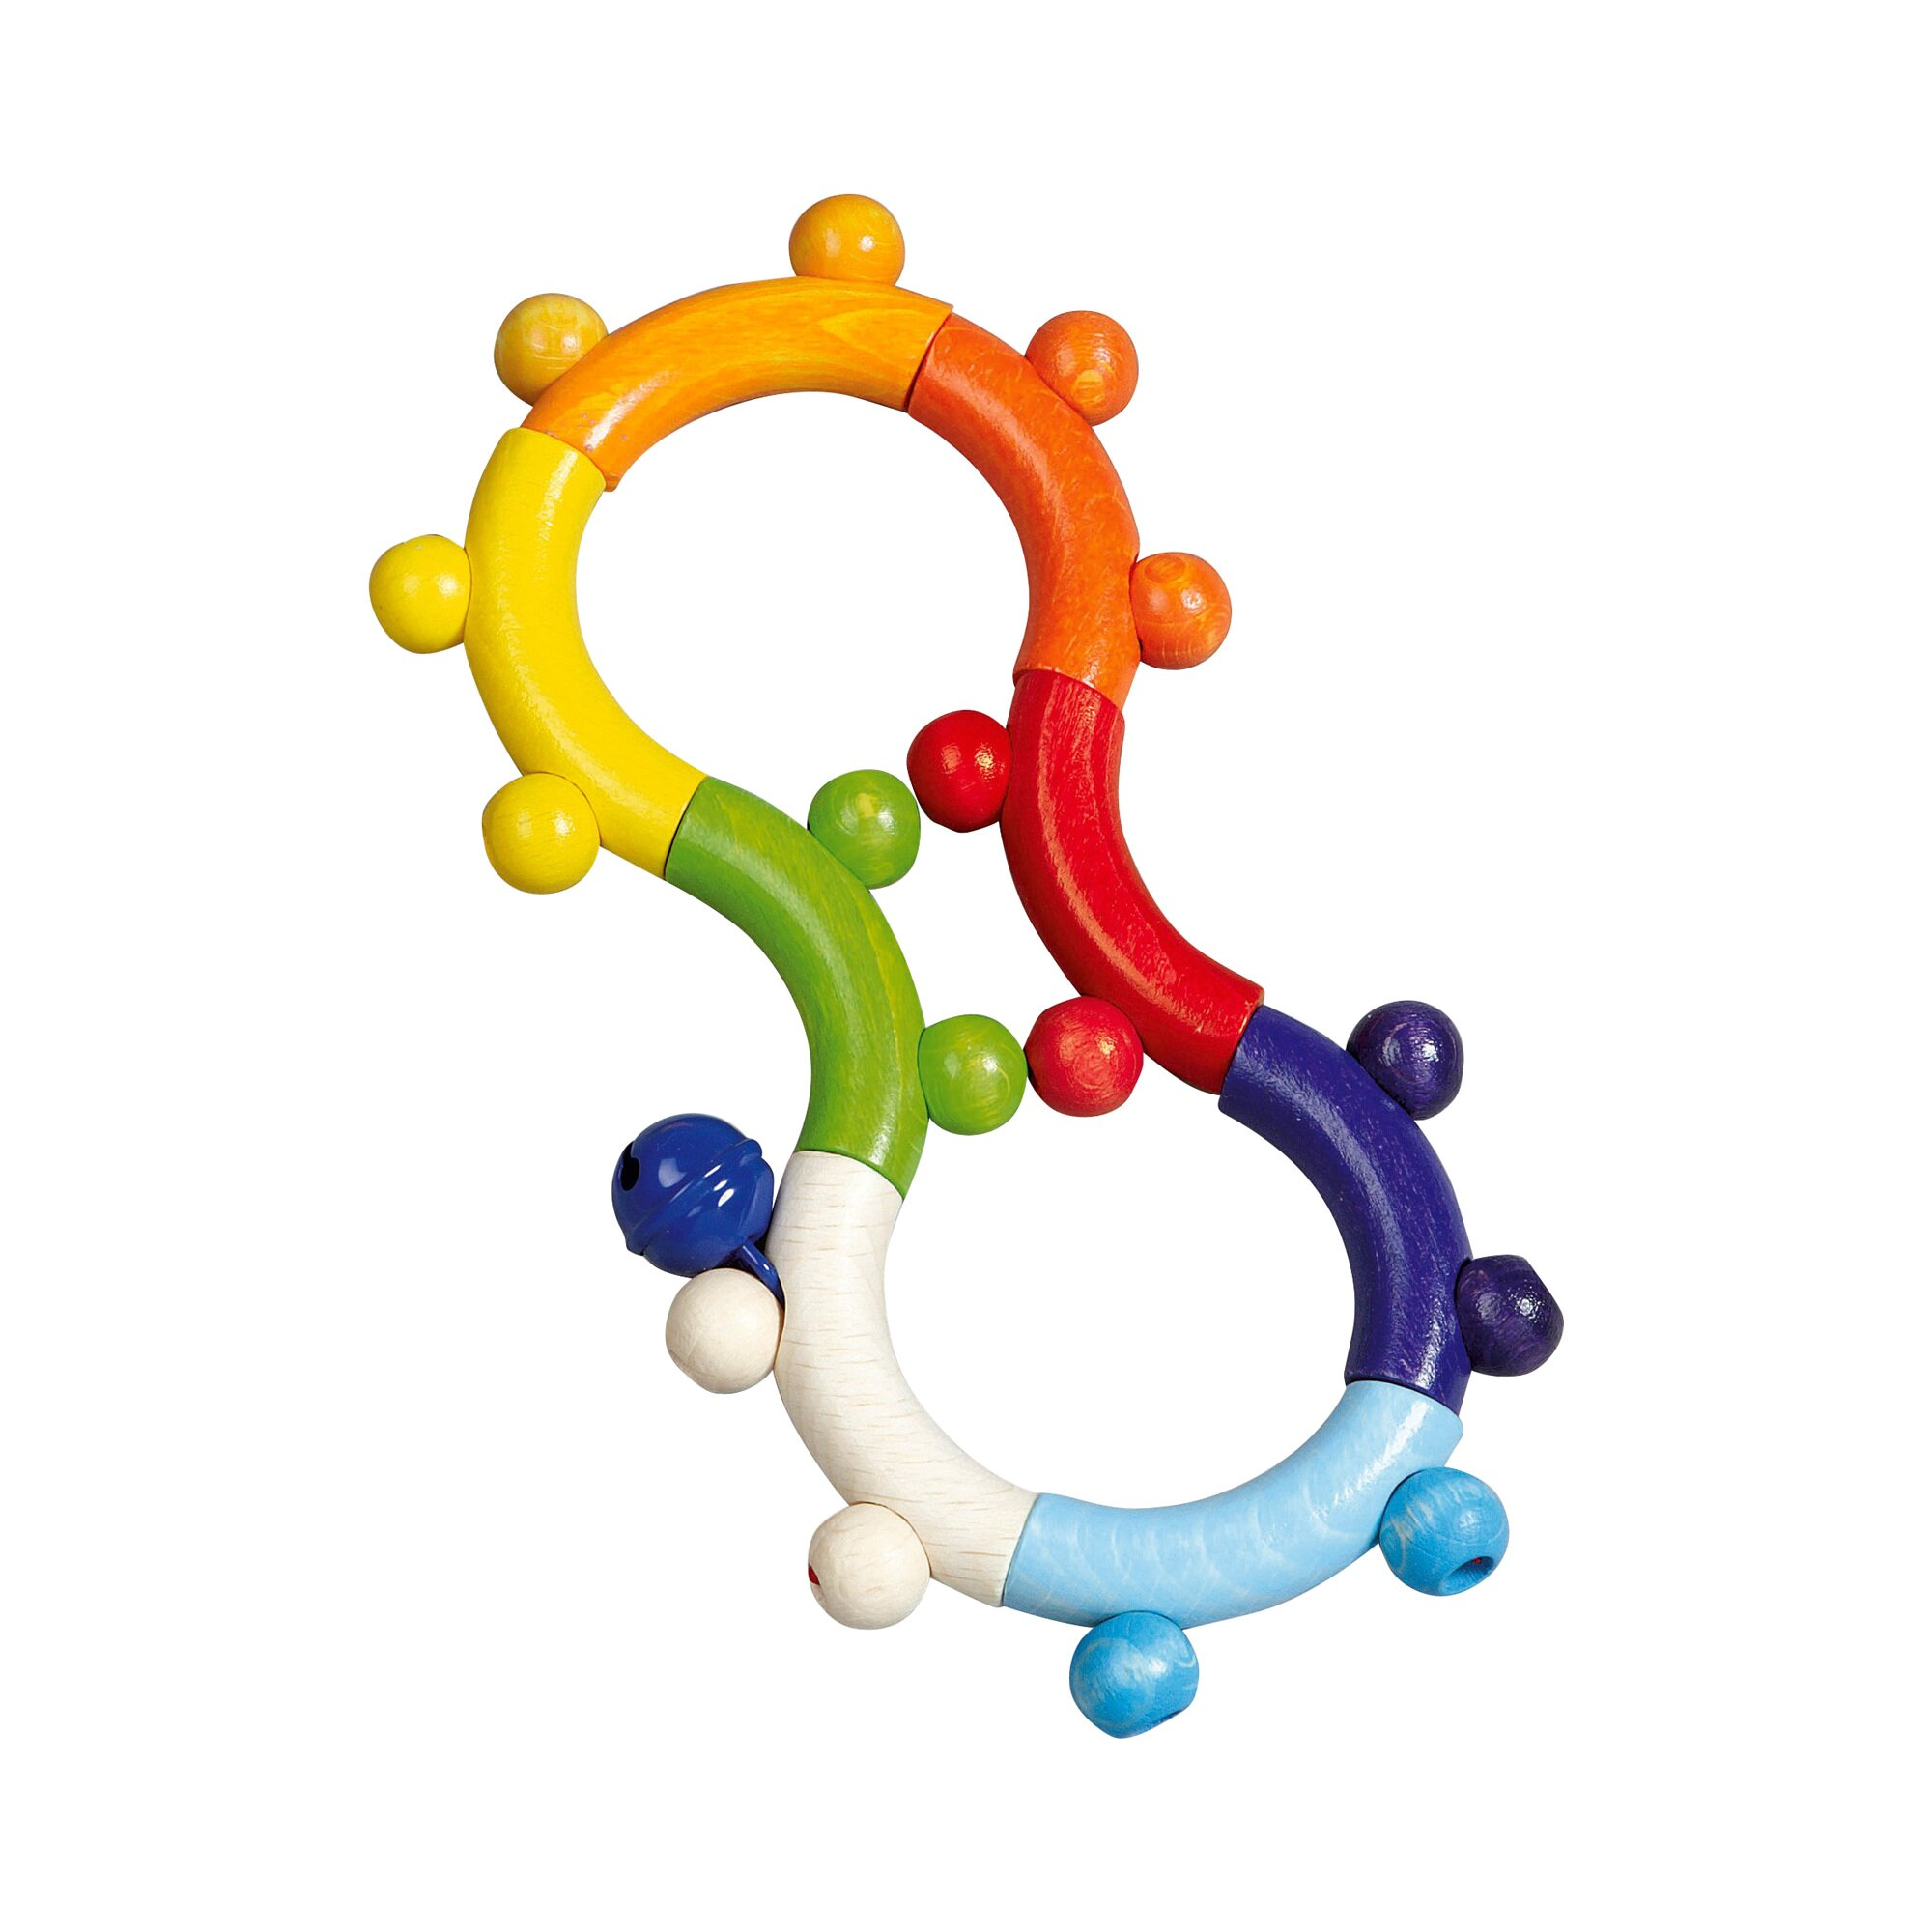 Hess Spielzeug Rassel Motorik 8